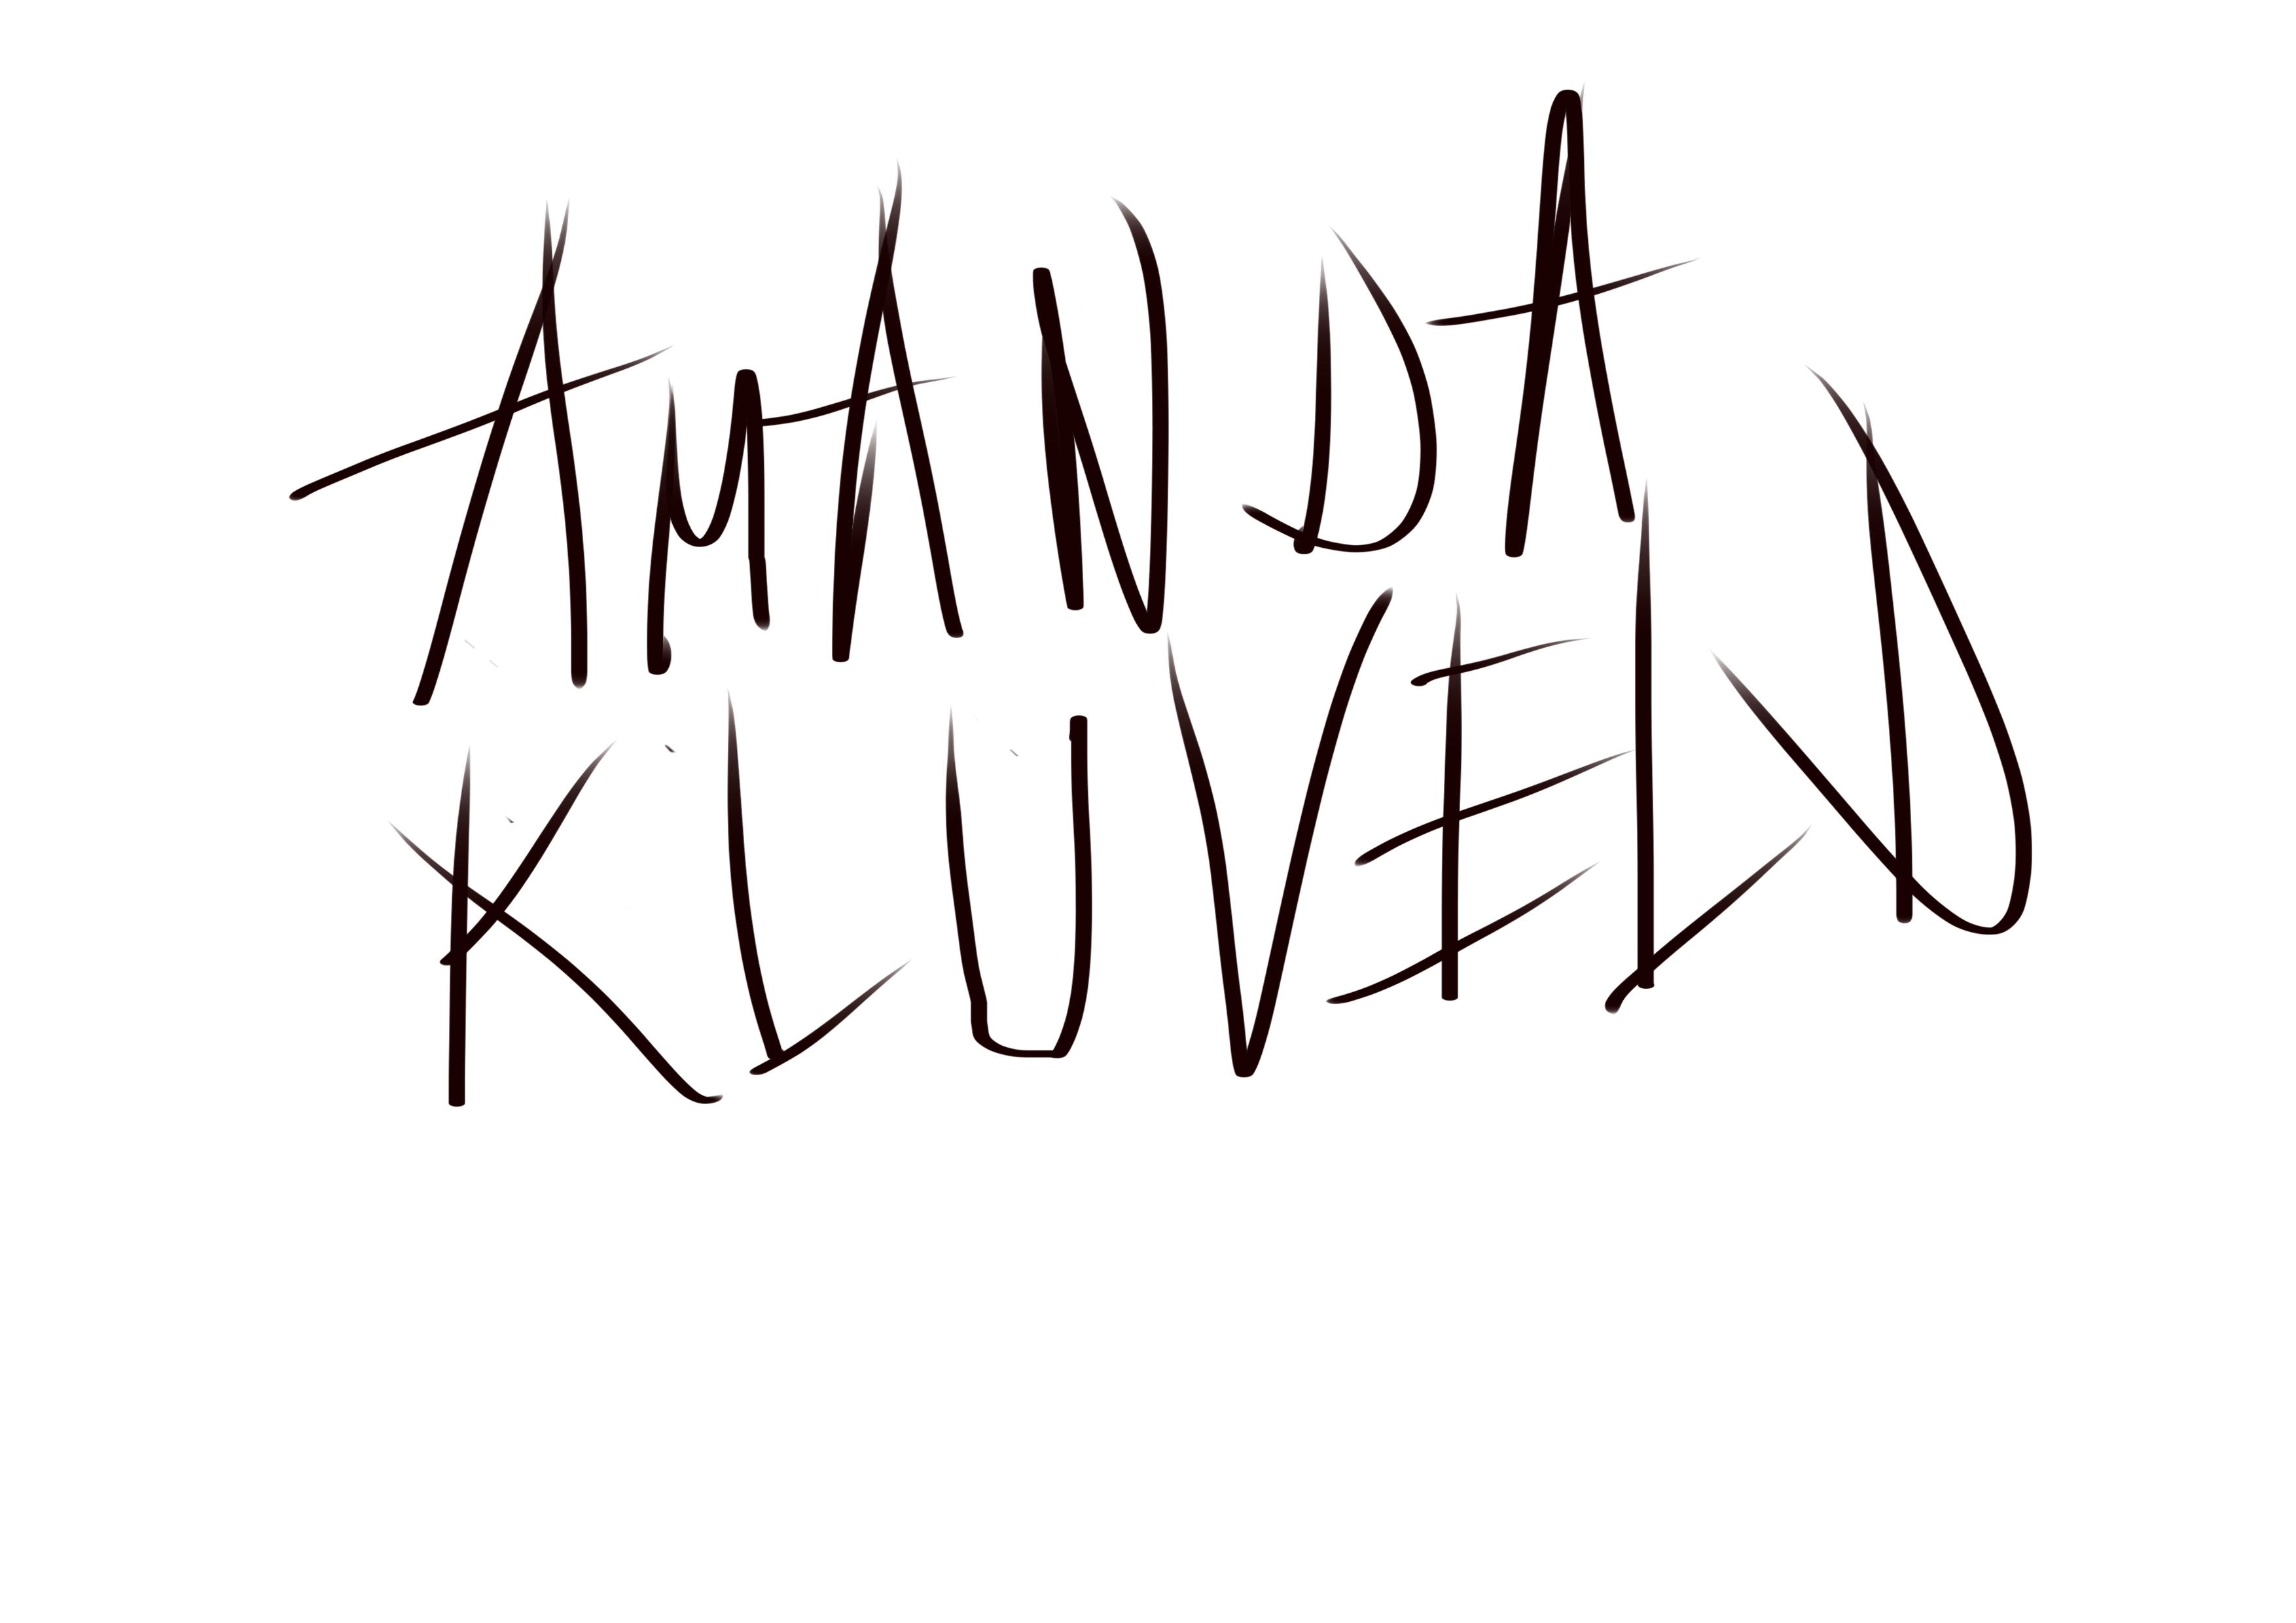 amanda kluveld's Signature